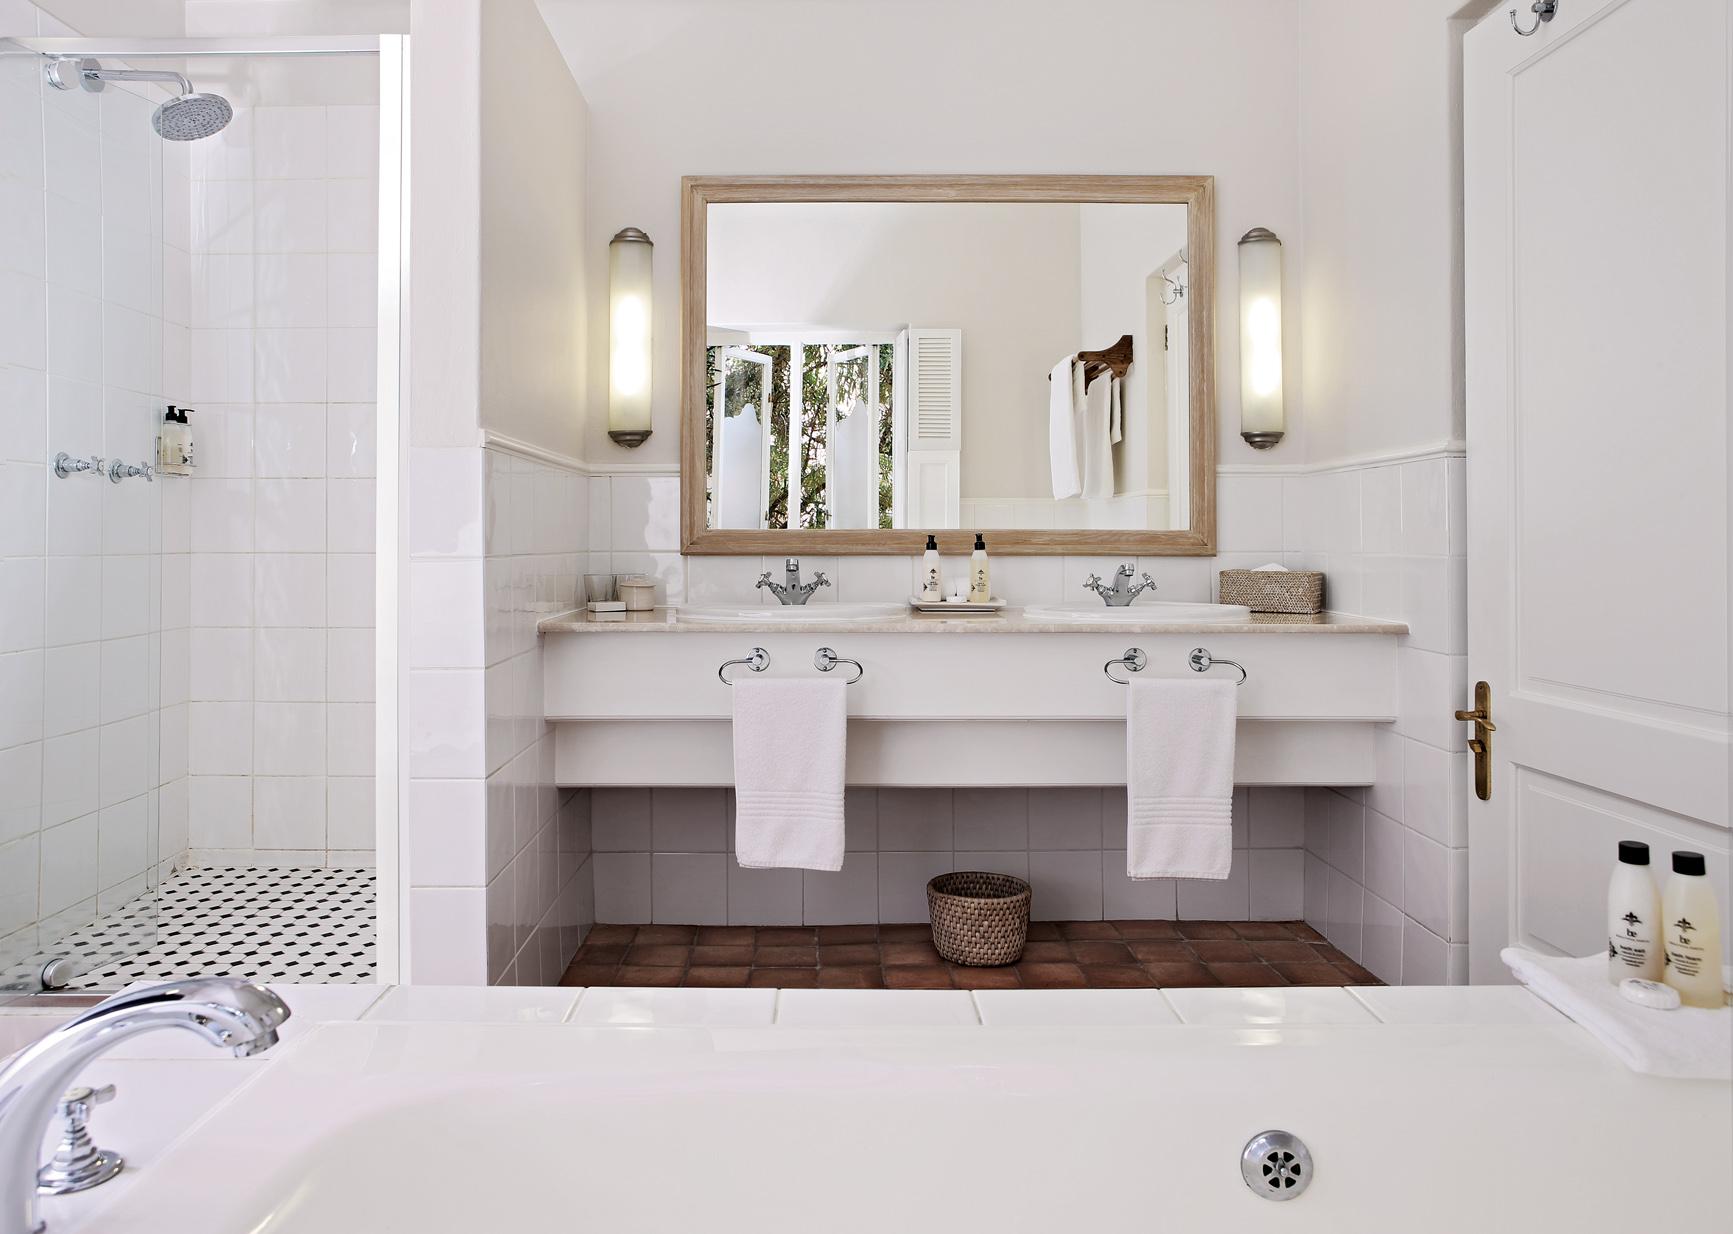 Hotel - Bathroom 1